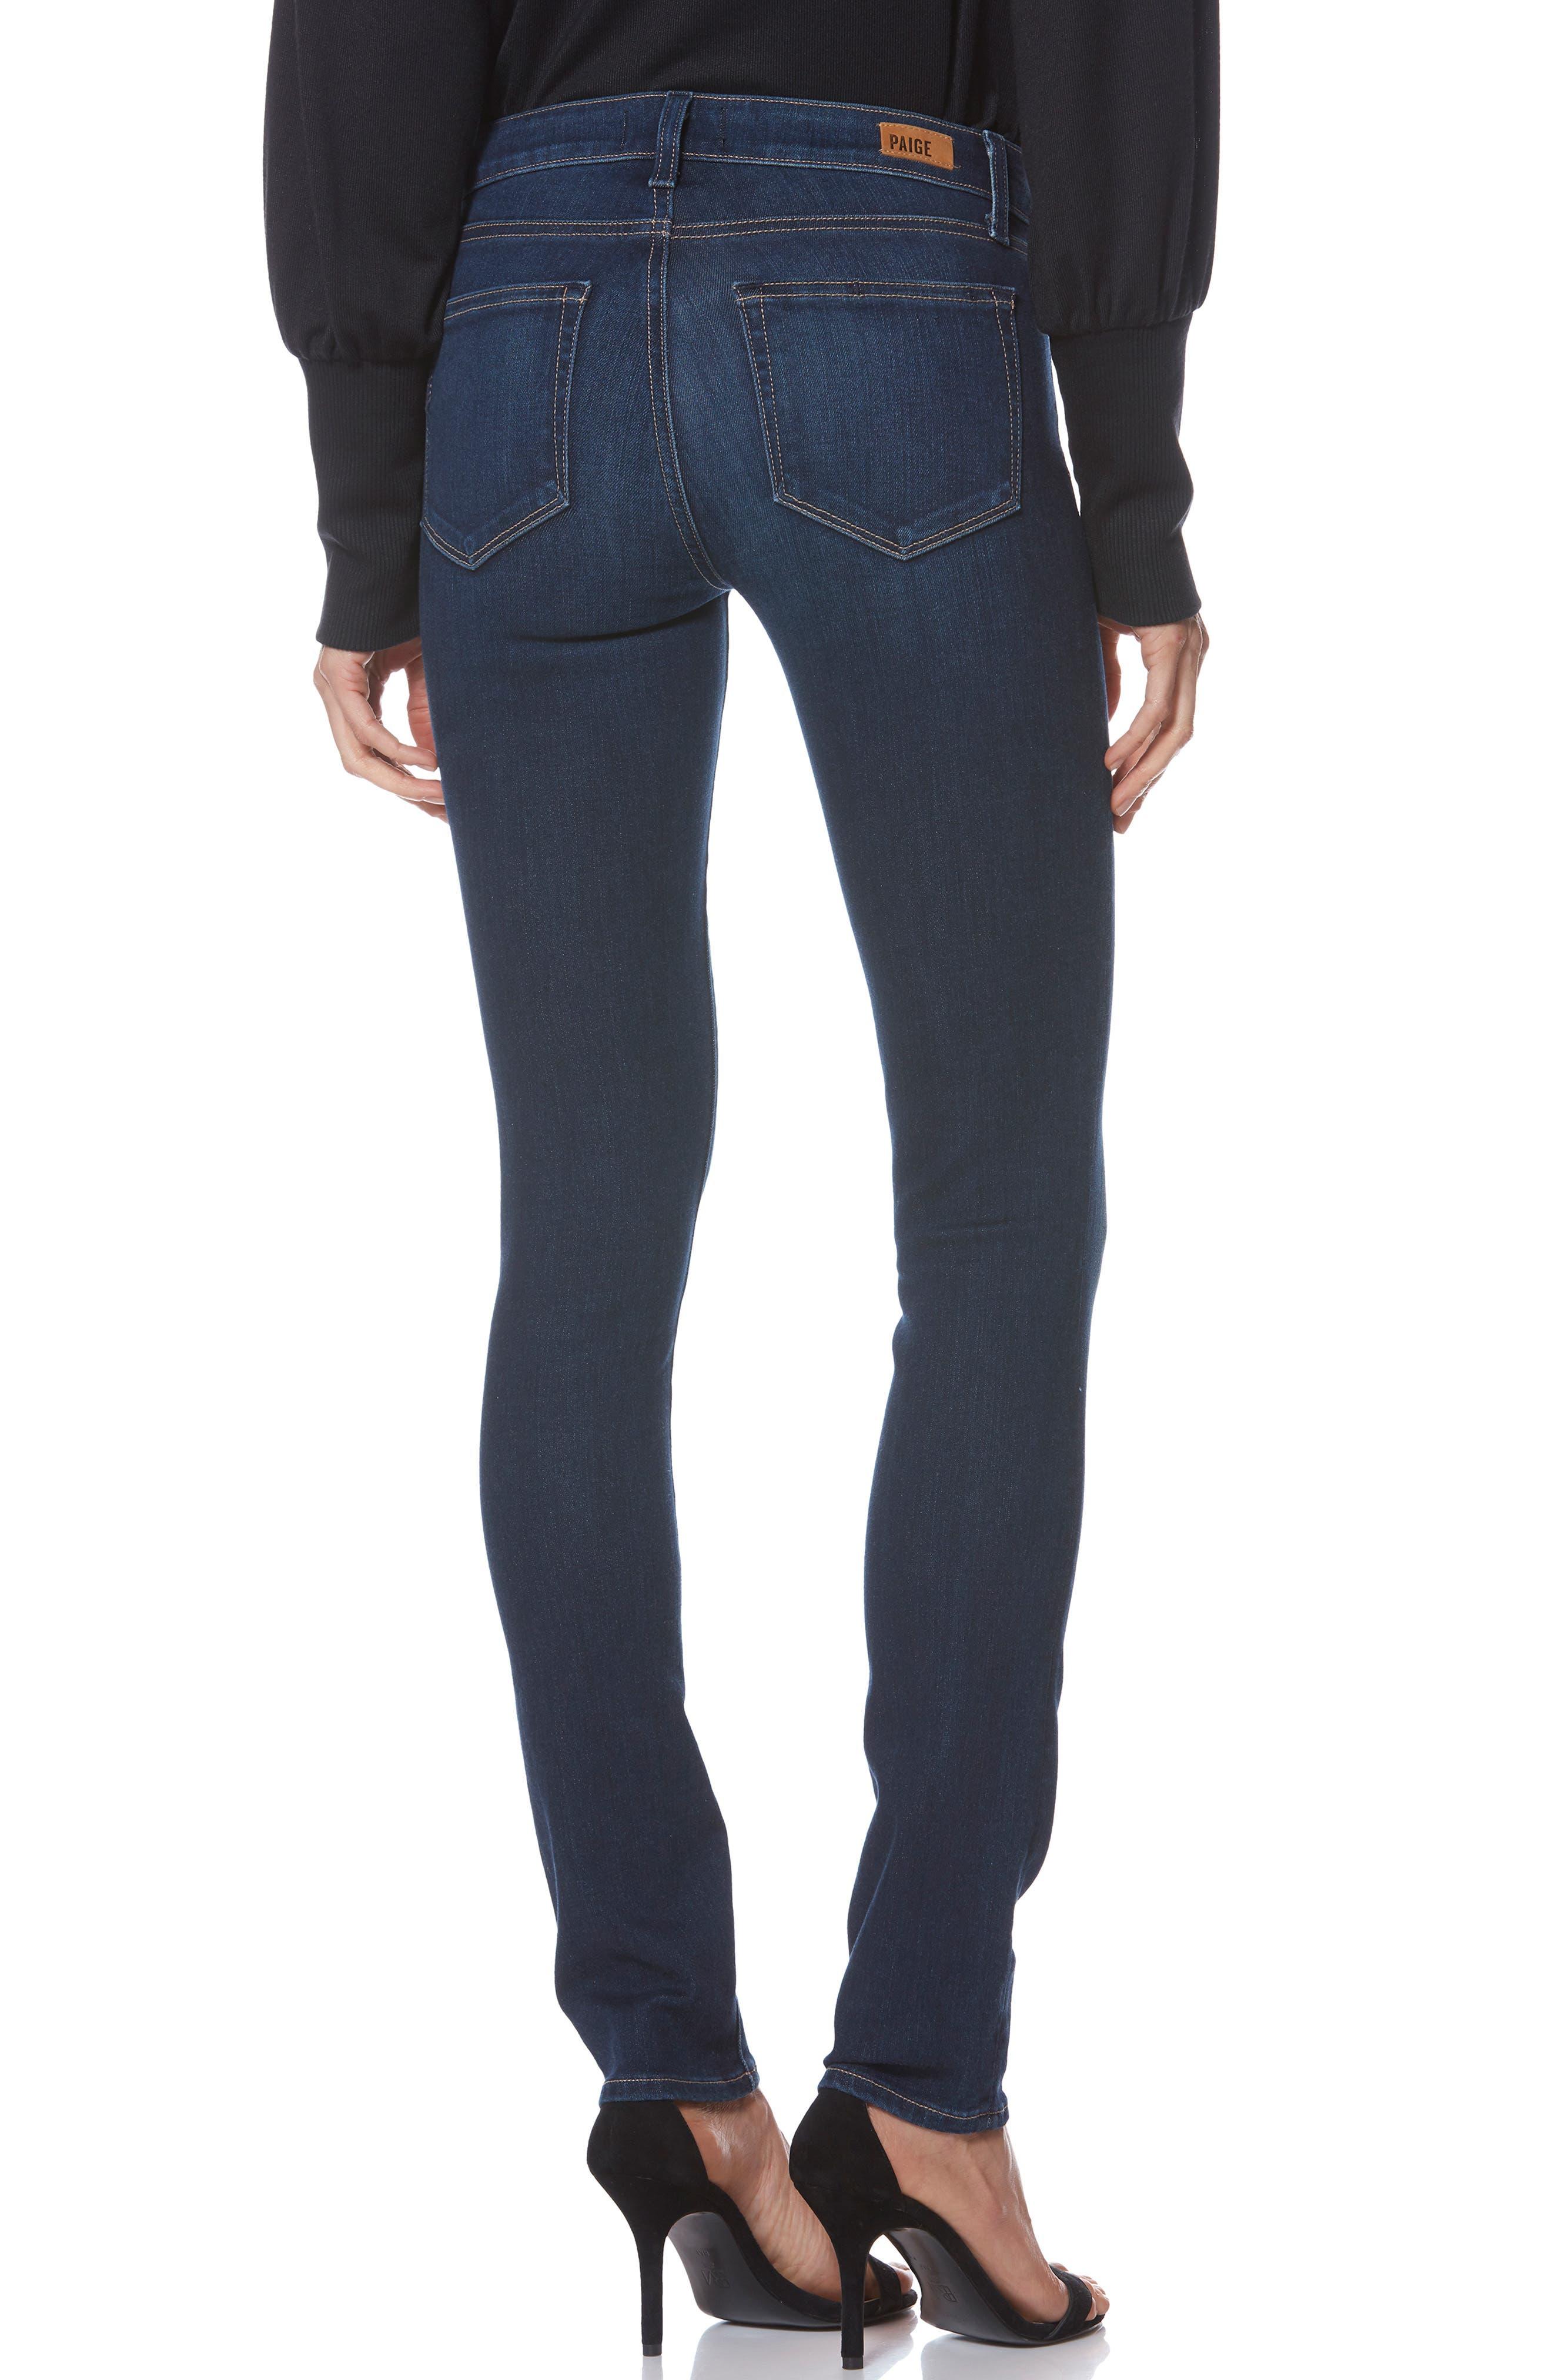 Skyline Skinny Jeans,                             Alternate thumbnail 2, color,                             IDLEWILD